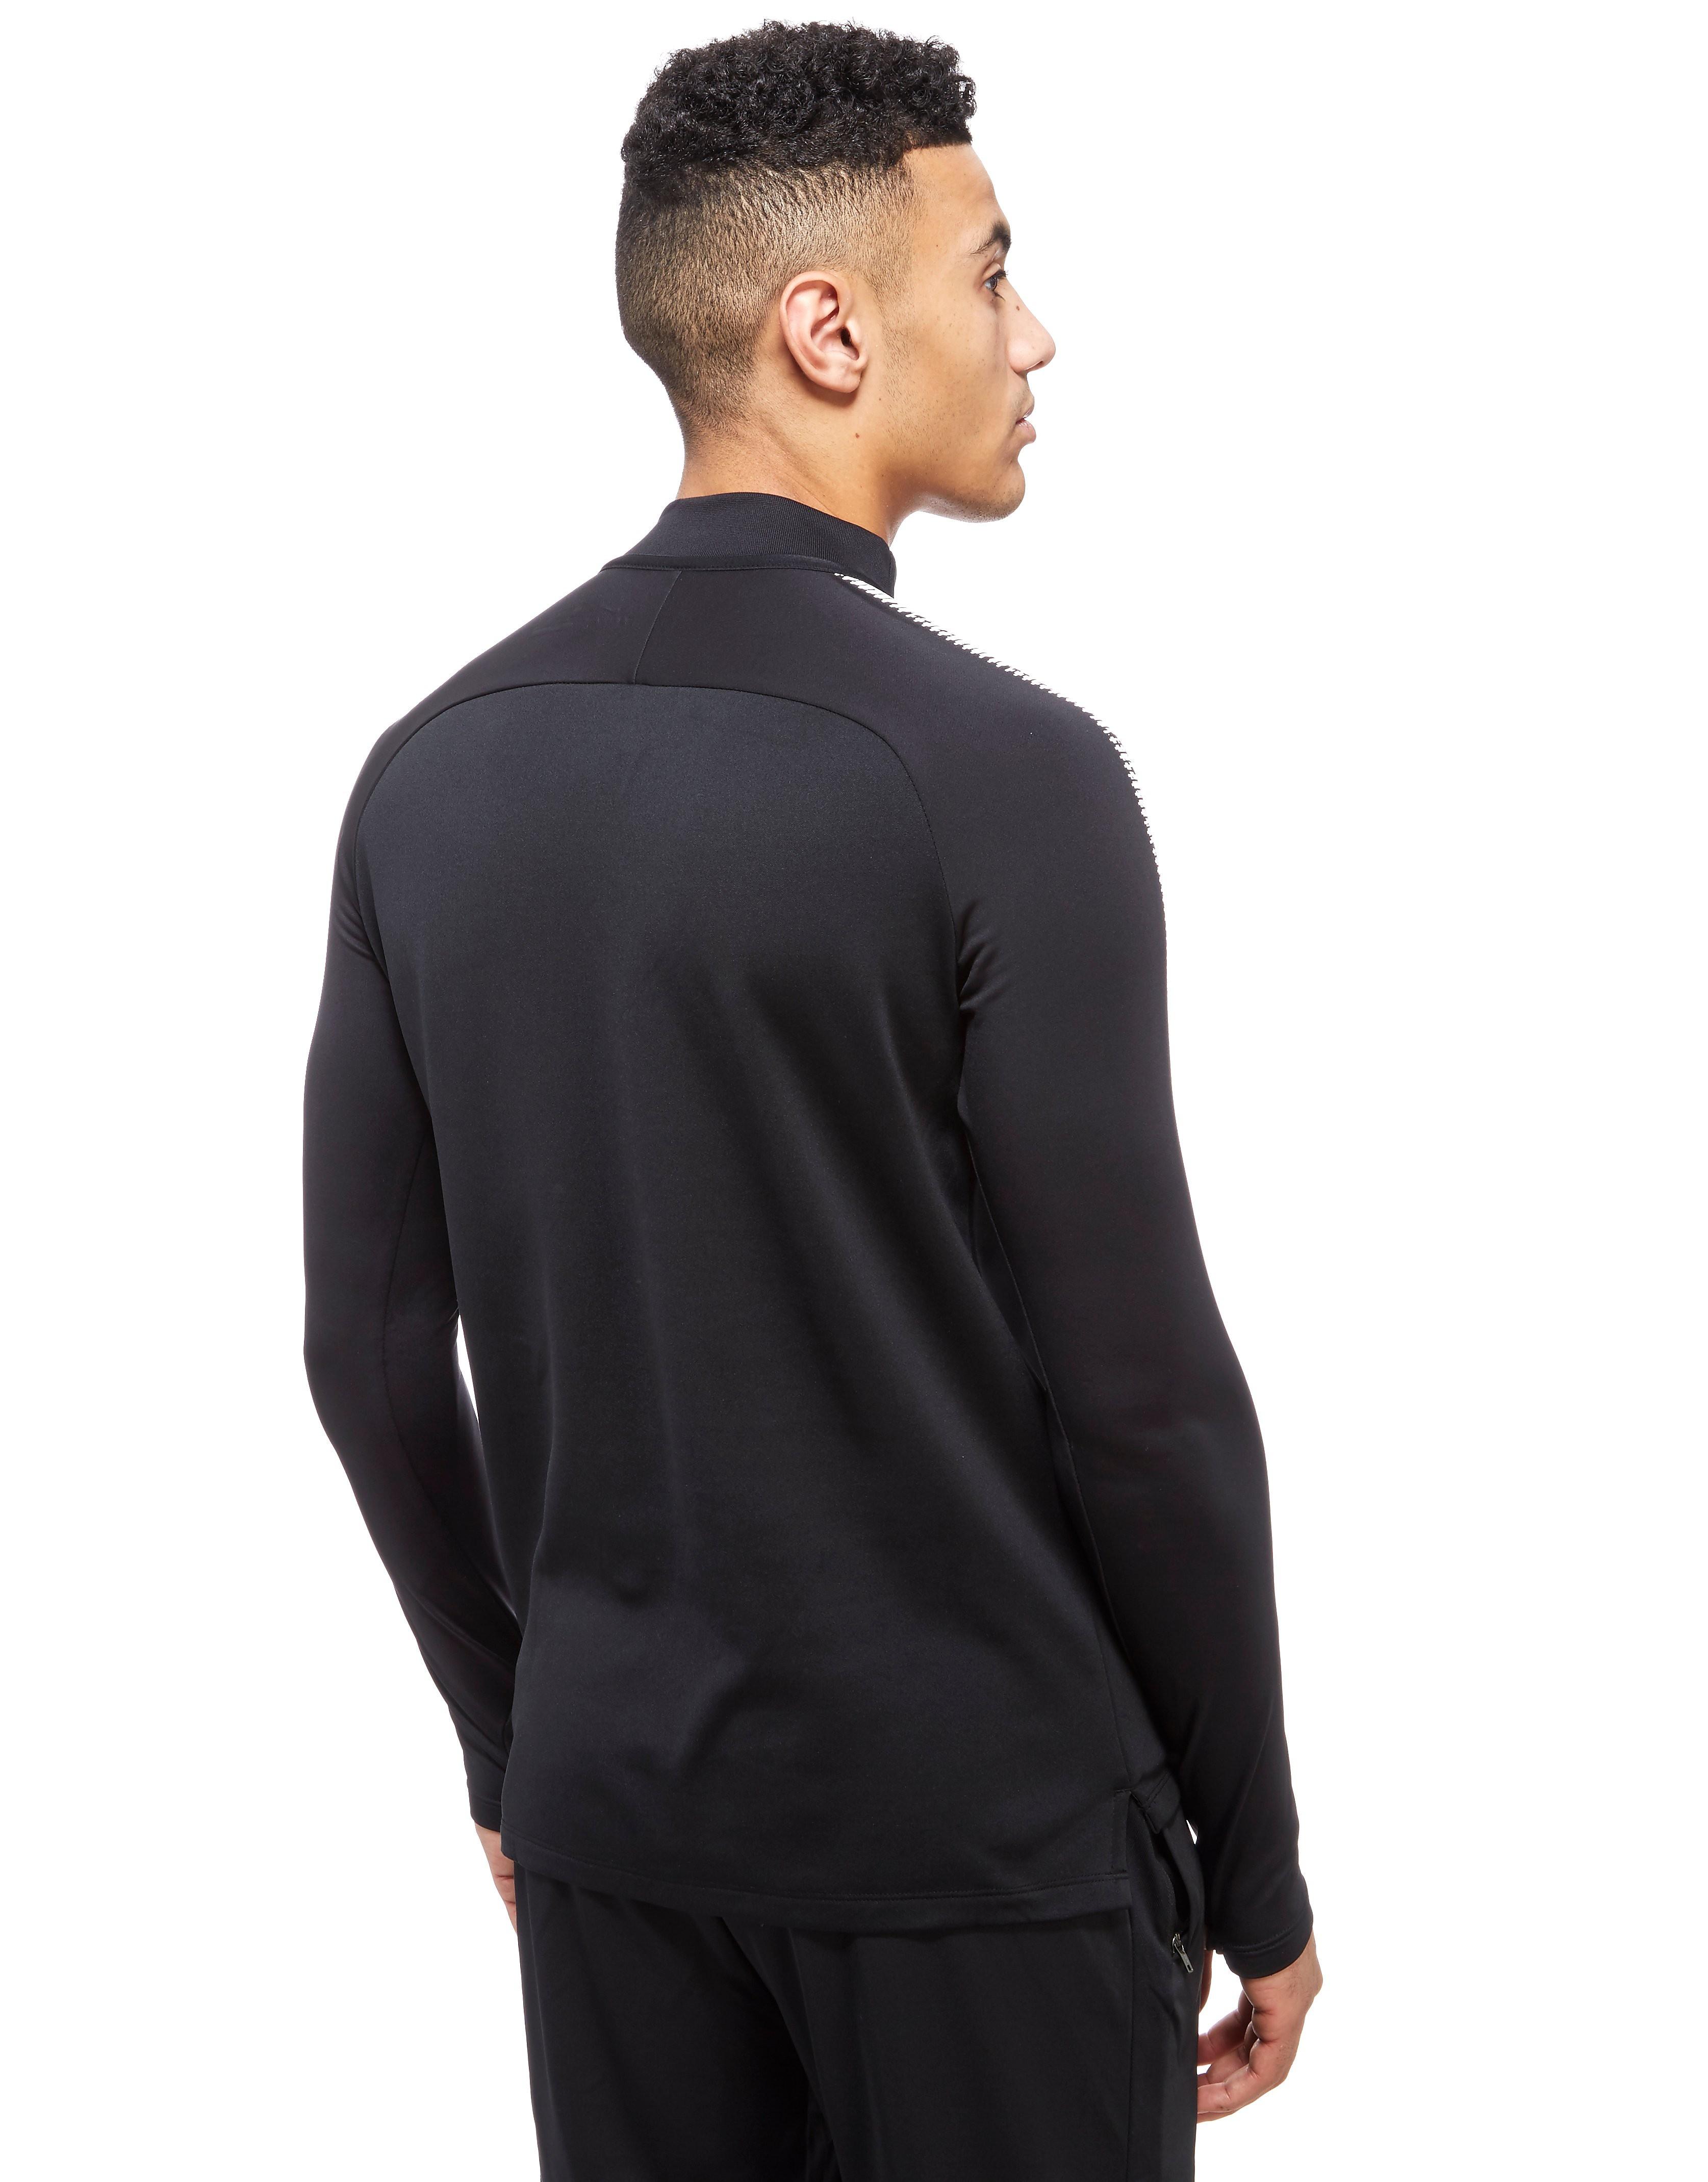 Nike Squad Long Sleeve Top